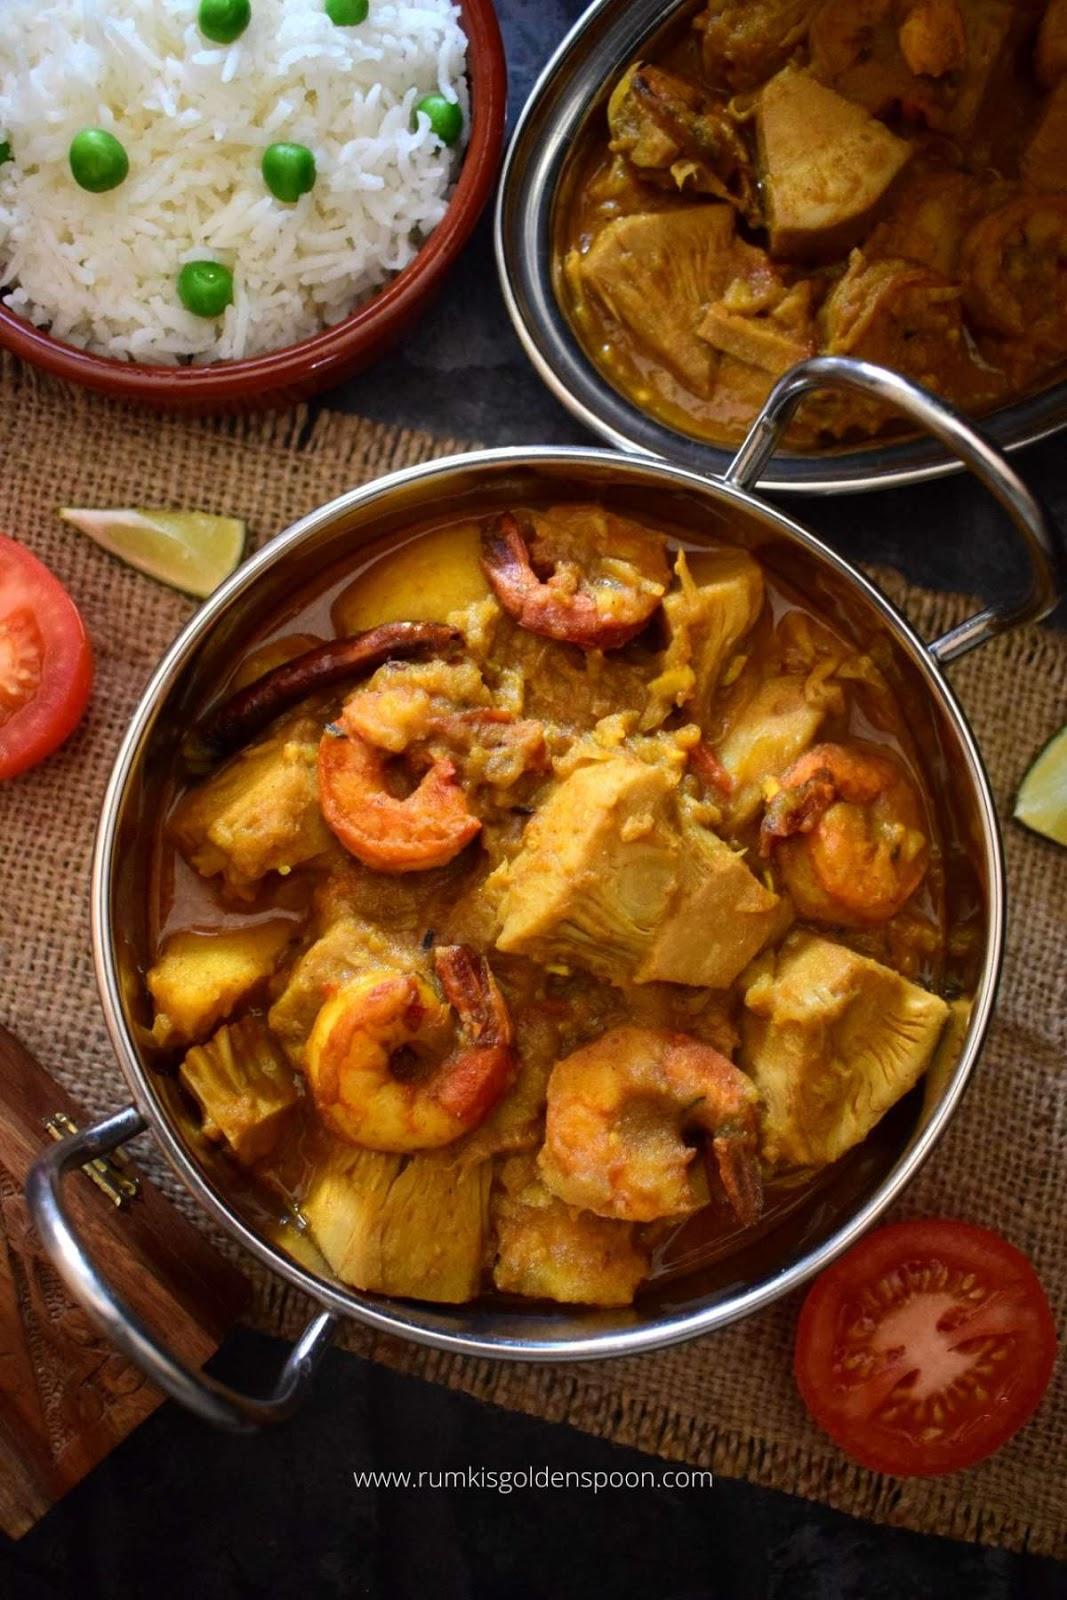 echor chingri, echor chingri recipe, echor chingri recipe Bengali, echor recipe, echor recipe Bengali, echor chingri bengali recipe, how to make echor chingri, chingri diye echor, kathal chingri recipe, kathaler echor recipe, echor ranna recipe, echor curry recipe, enchor chingri, kathal chingri, gach patha recipe, gach patha, kathal ki sabzi, kathal ki sabzi recipe, kathal ki sabzi with gravy, how to make kathal ki sabzi, recipe for kathal ki sabzi, recipe of kathal ki sabzi, kathal ki sabzi bengali style, jackfruit curry, recipe for jackfruit curry, jackfruit curry recipe, jackfruit curry bengali style, Jackfruit with prawn recipe, Bengali style jackfruit curry, jackfruit shrimp curry, bengali recipe, bengali recipes, bengali food, bengali food recipes, traditional bengali food, Bengali recipe fish, Bengali recipes fish, Rumki's Golden Spoon